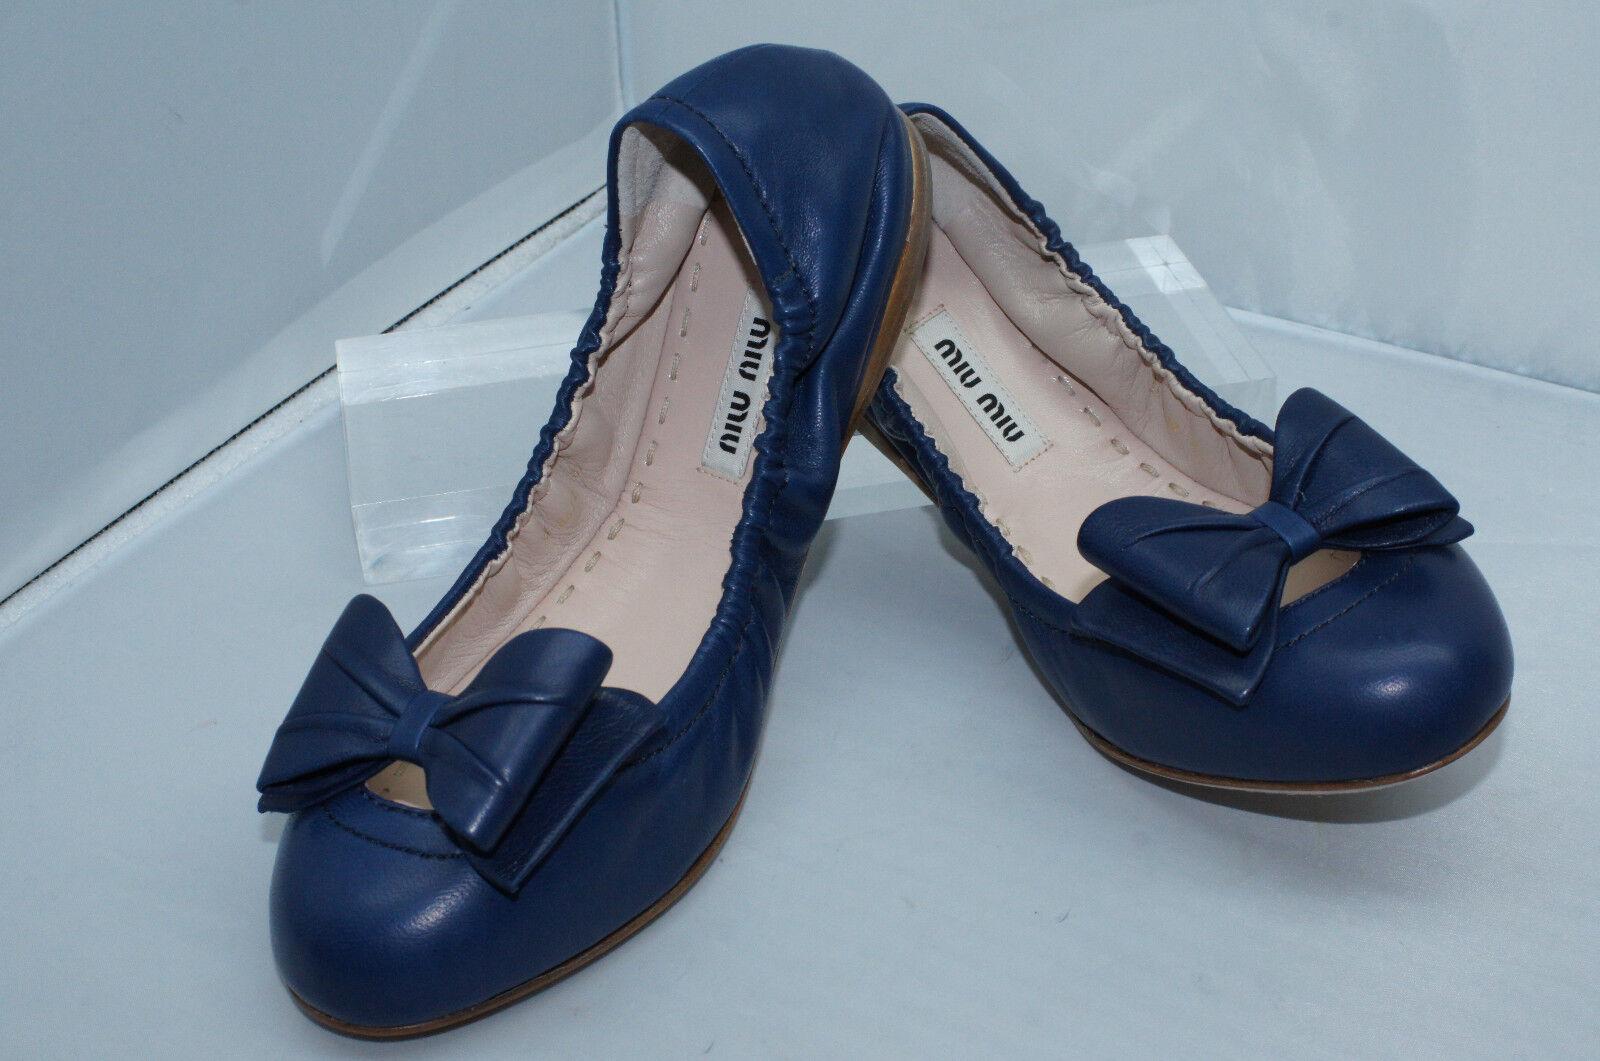 New Flats Miu Miu Prada schuhes blau Ballerina Flats New Size 9 Calzature Donna ed0b4c